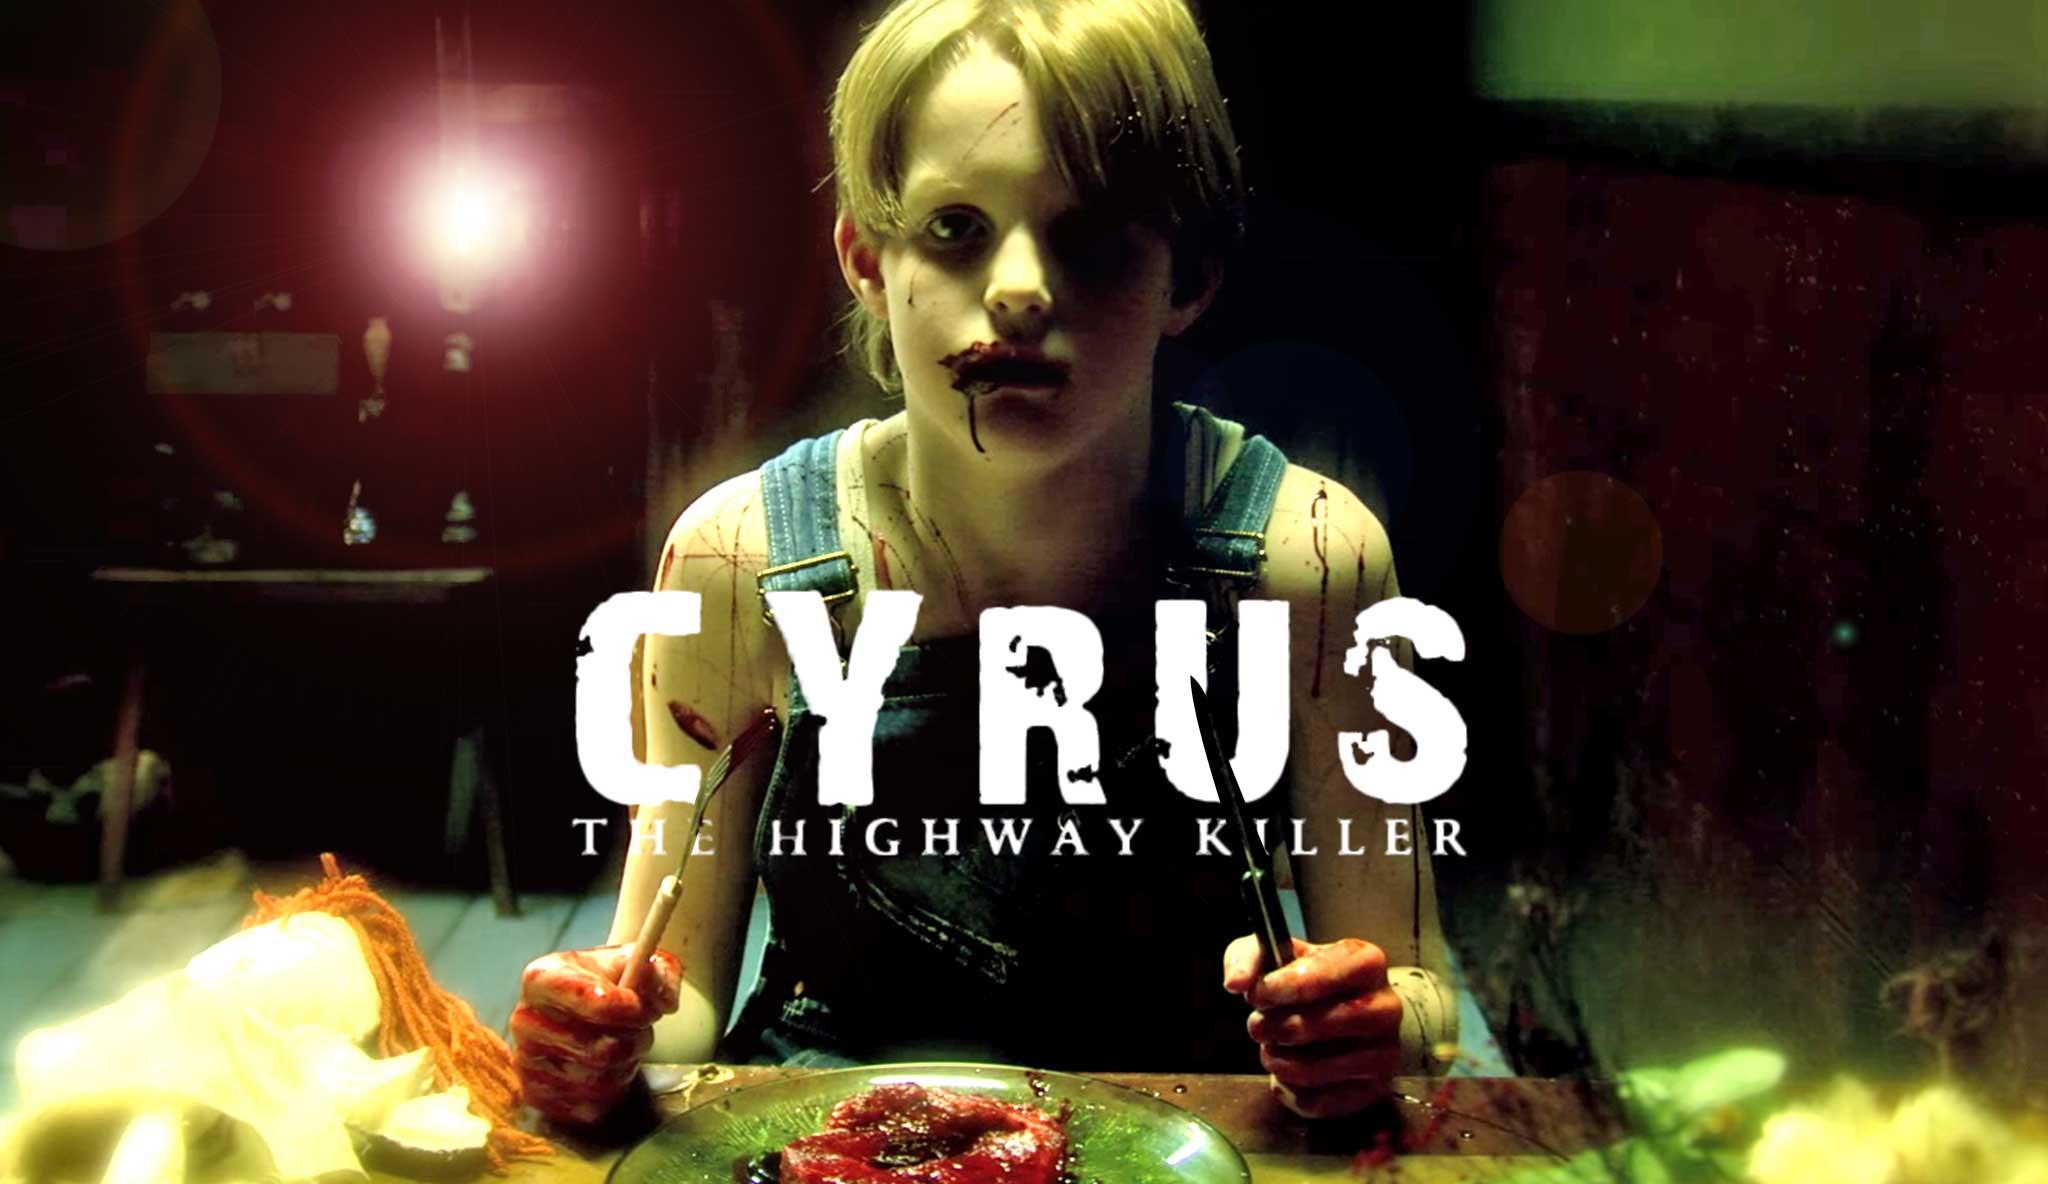 cyrus-the-highway-killer\header.jpg